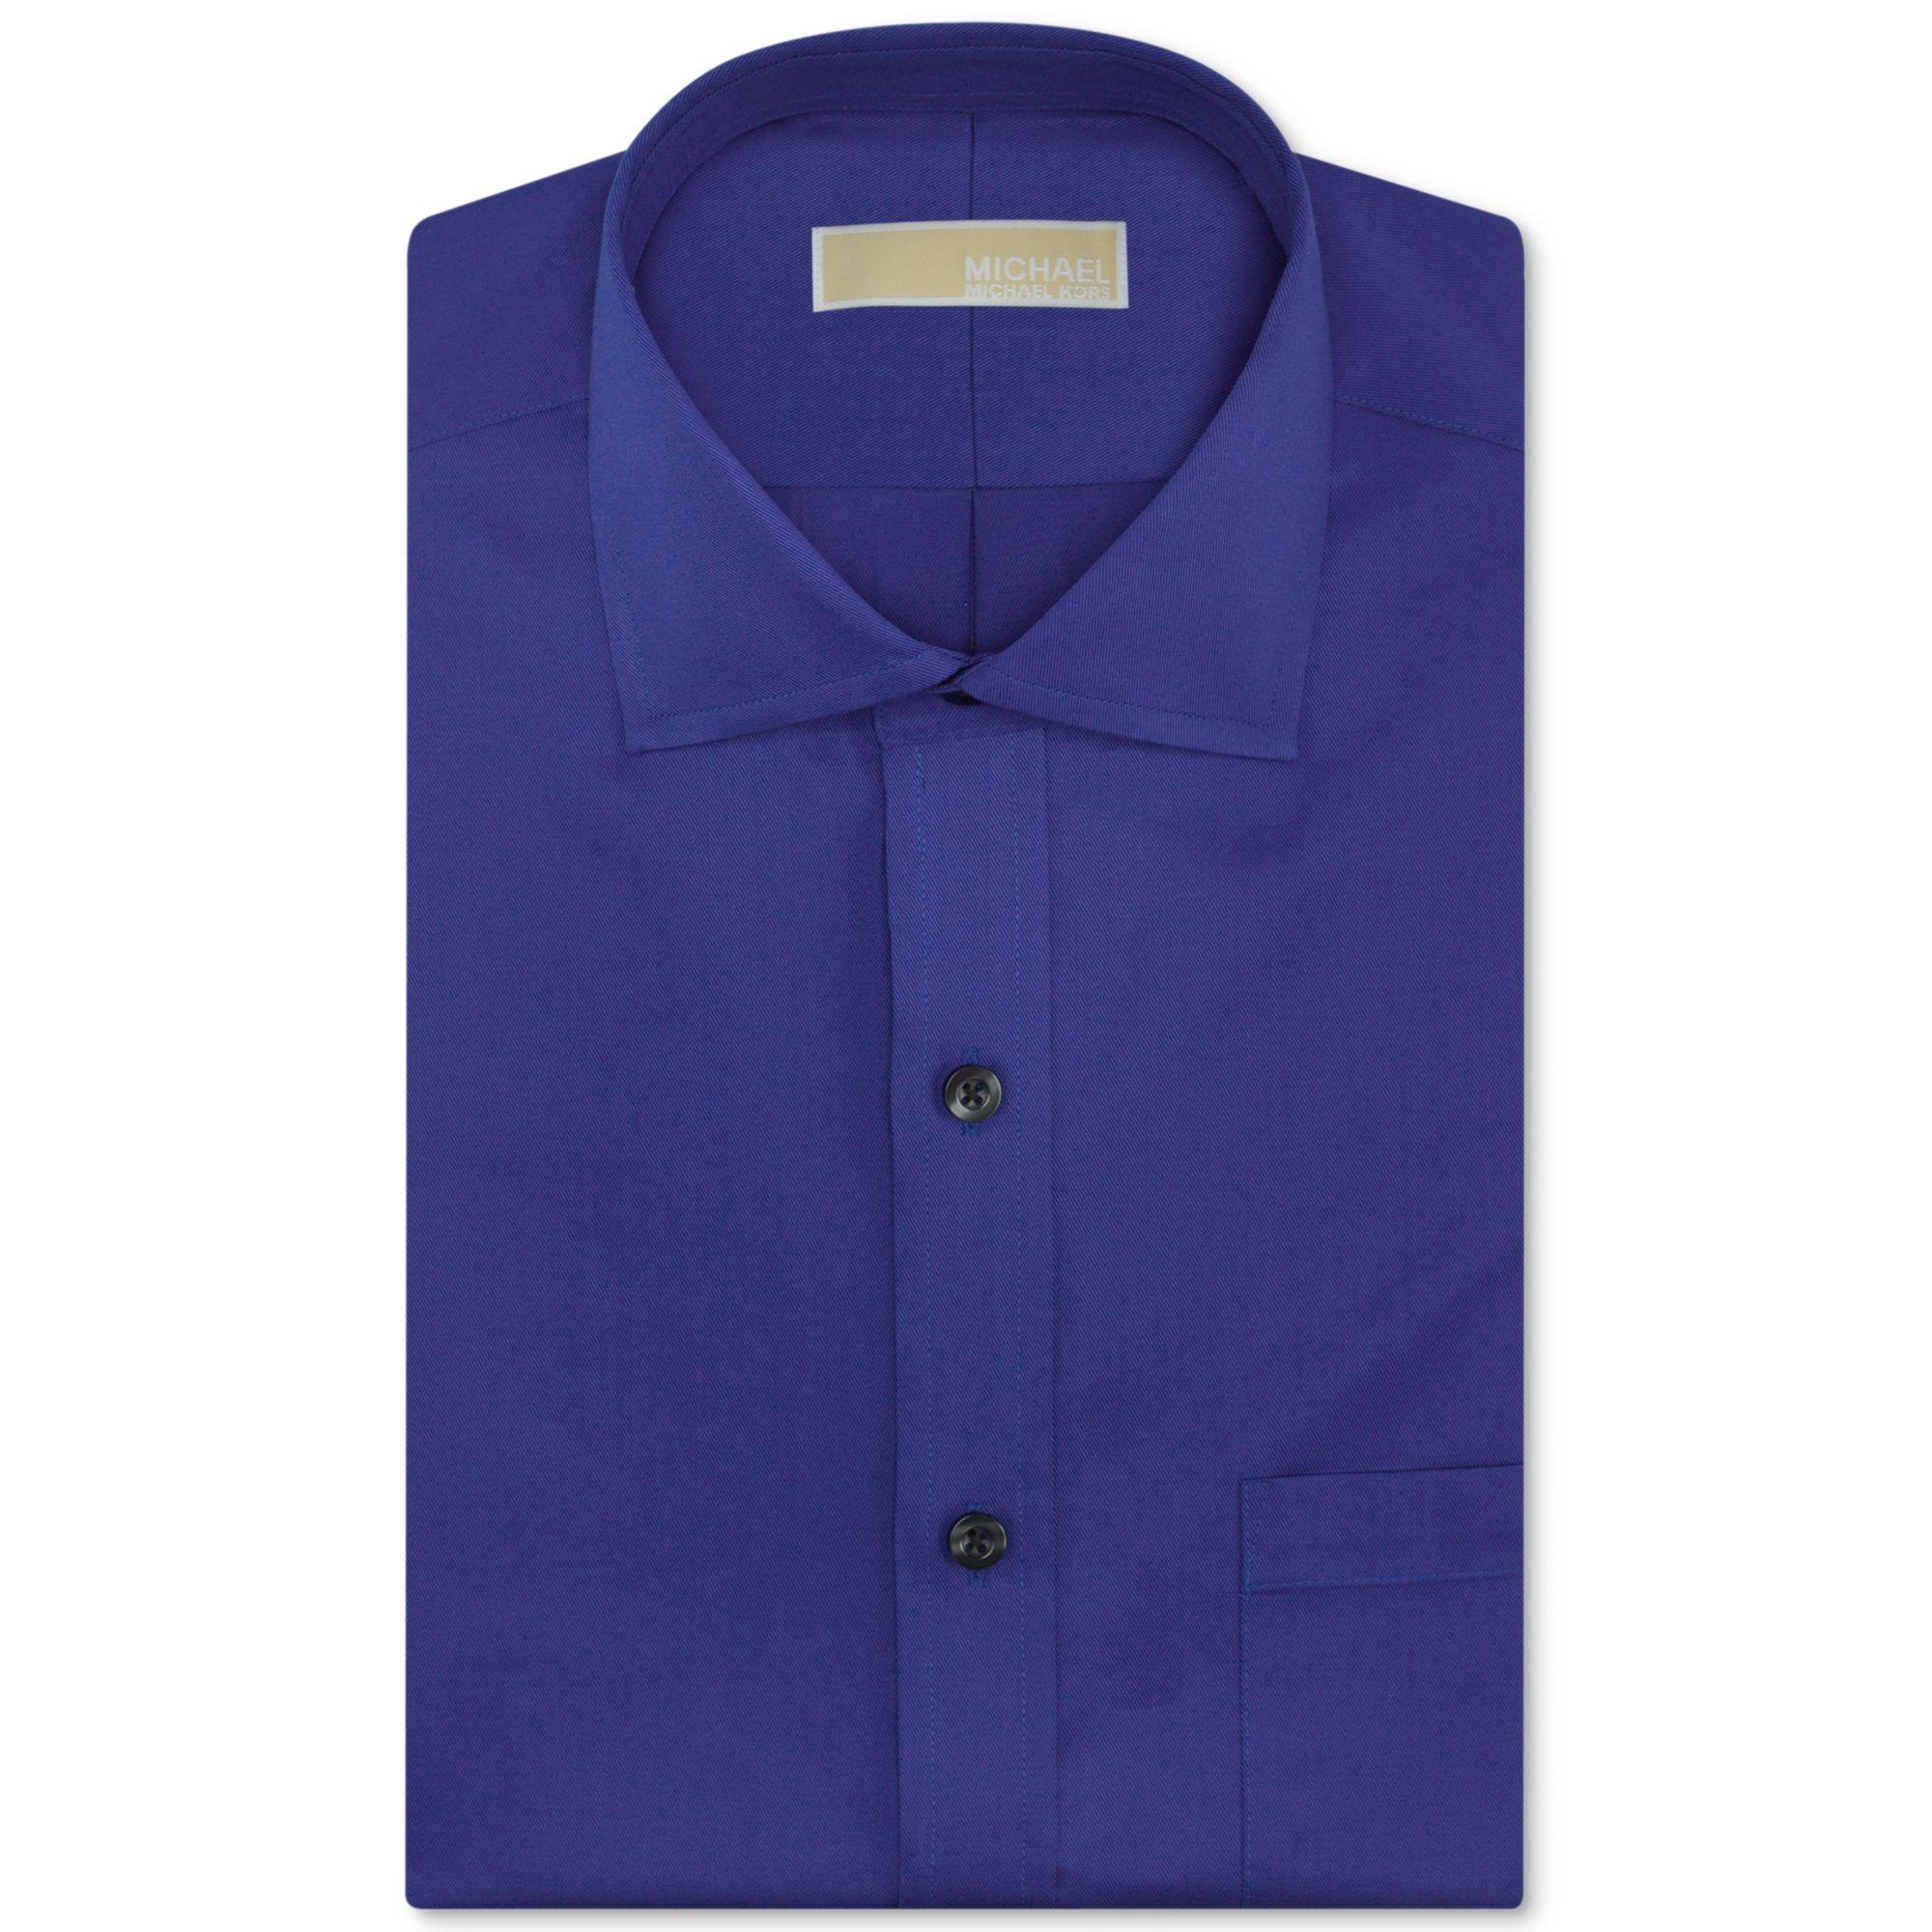 Michael Kors Michael No Iron Twill Solid Dress Shirt In